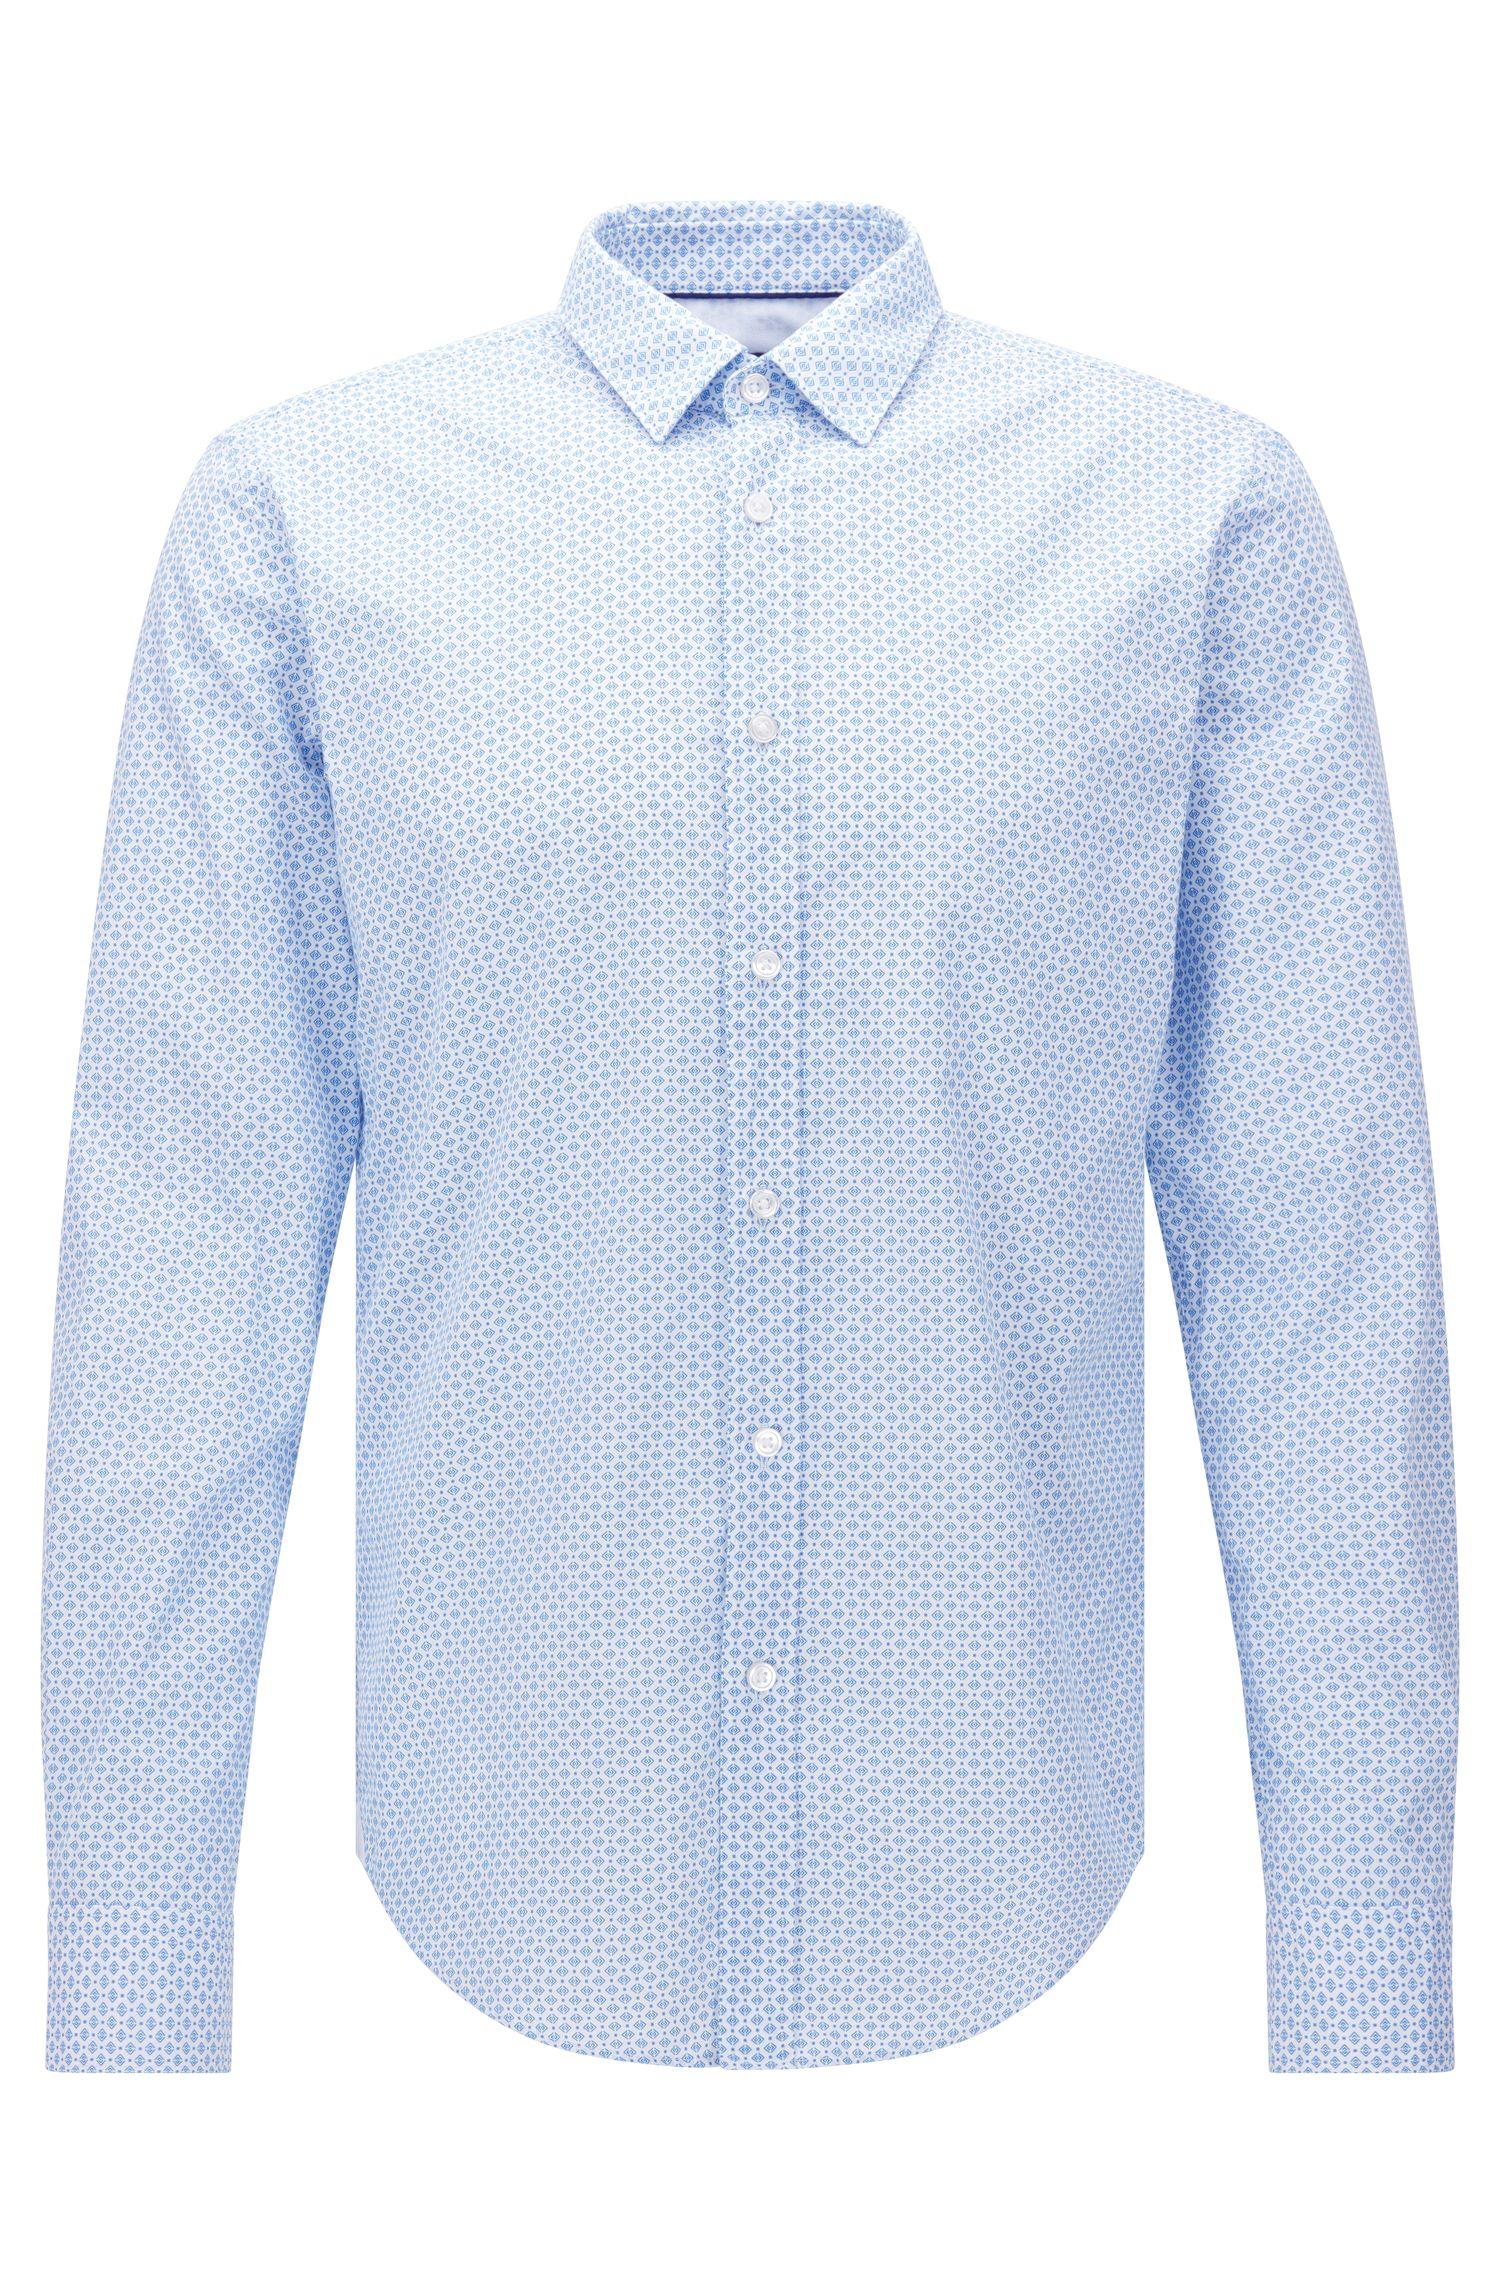 Gemustertes Slim-Fit Hemd aus Baumwolle: 'Ronni_44'